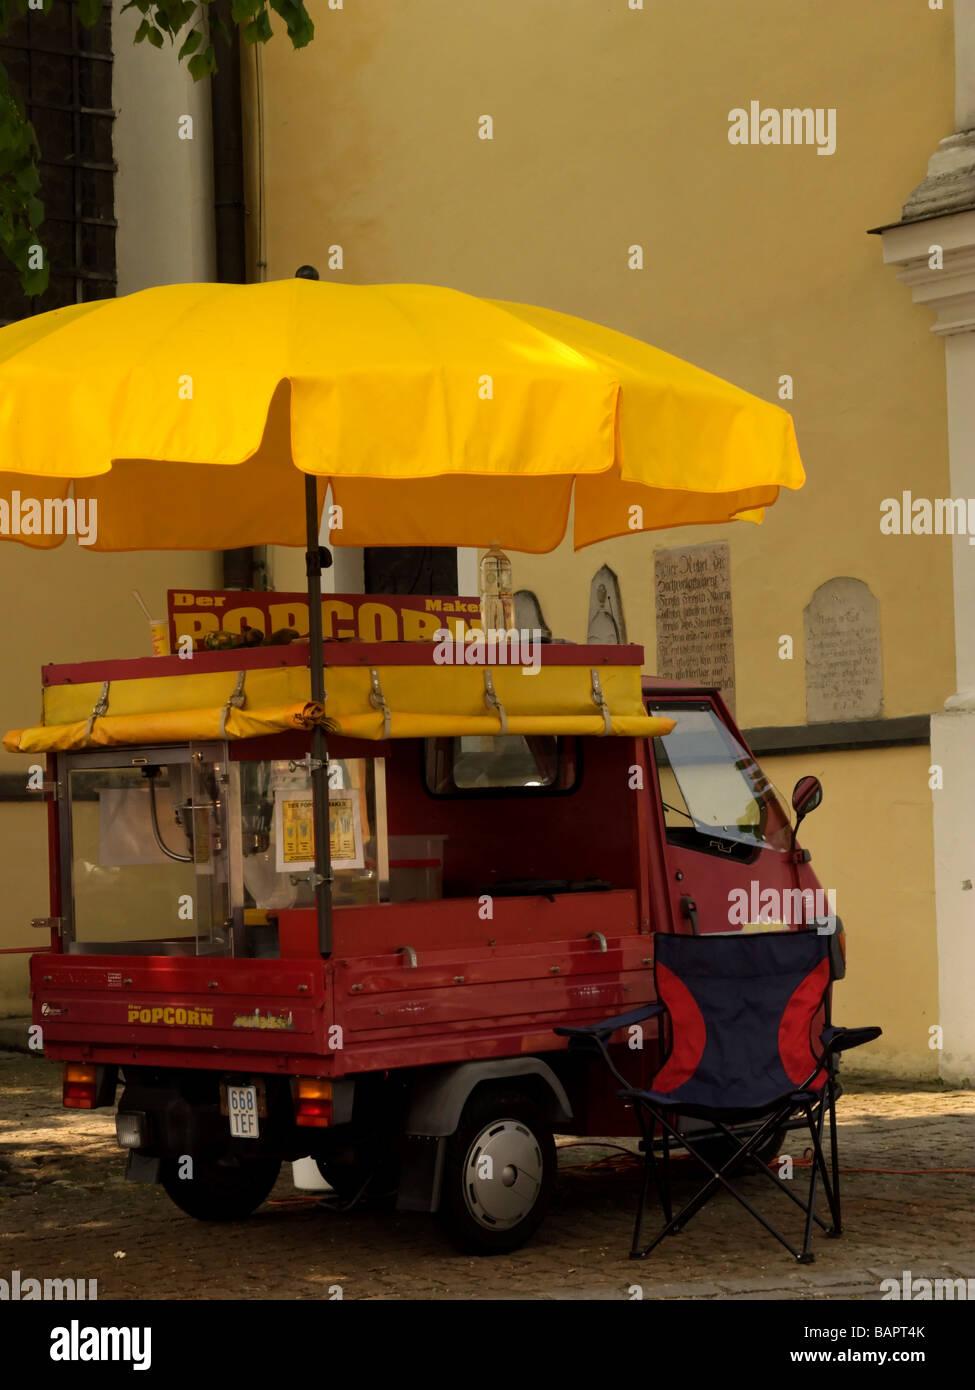 Red Ape Motor Vehicle Popcorn Stall Prien Bavaria Germany - Stock Image